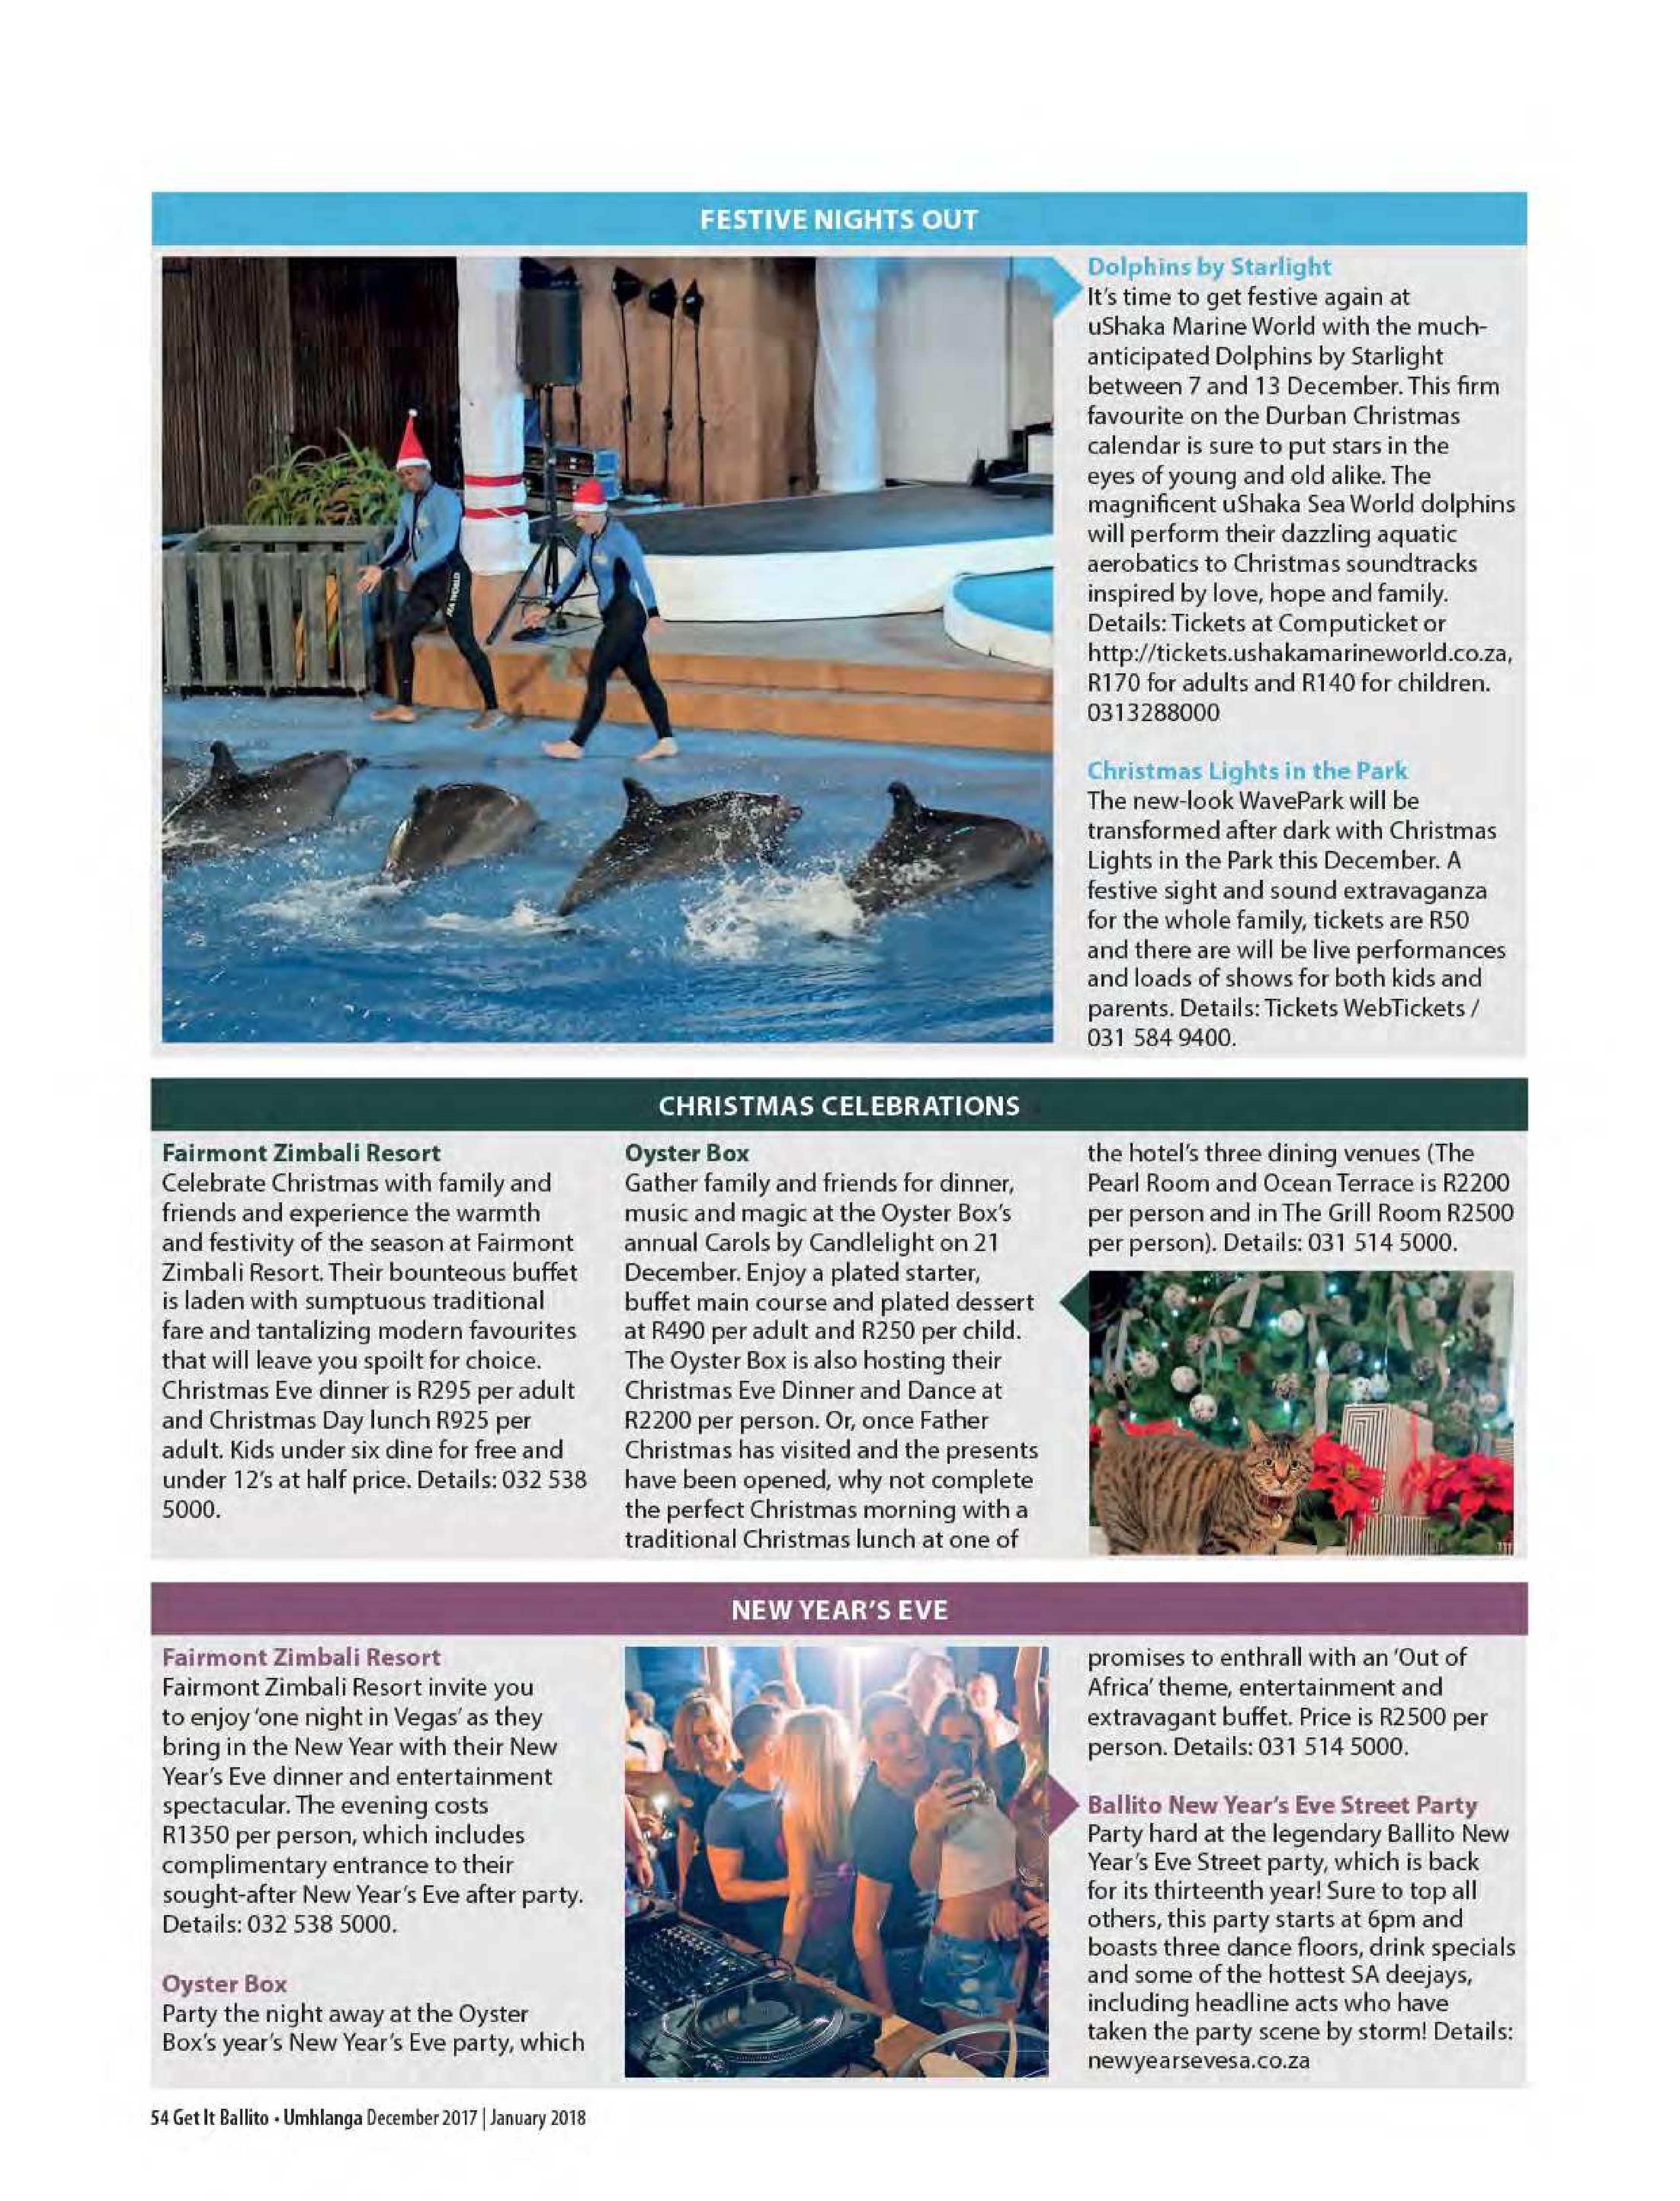 get-magazine-ballitoumhlanga-december-2017-january-2018-2-epapers-page-56